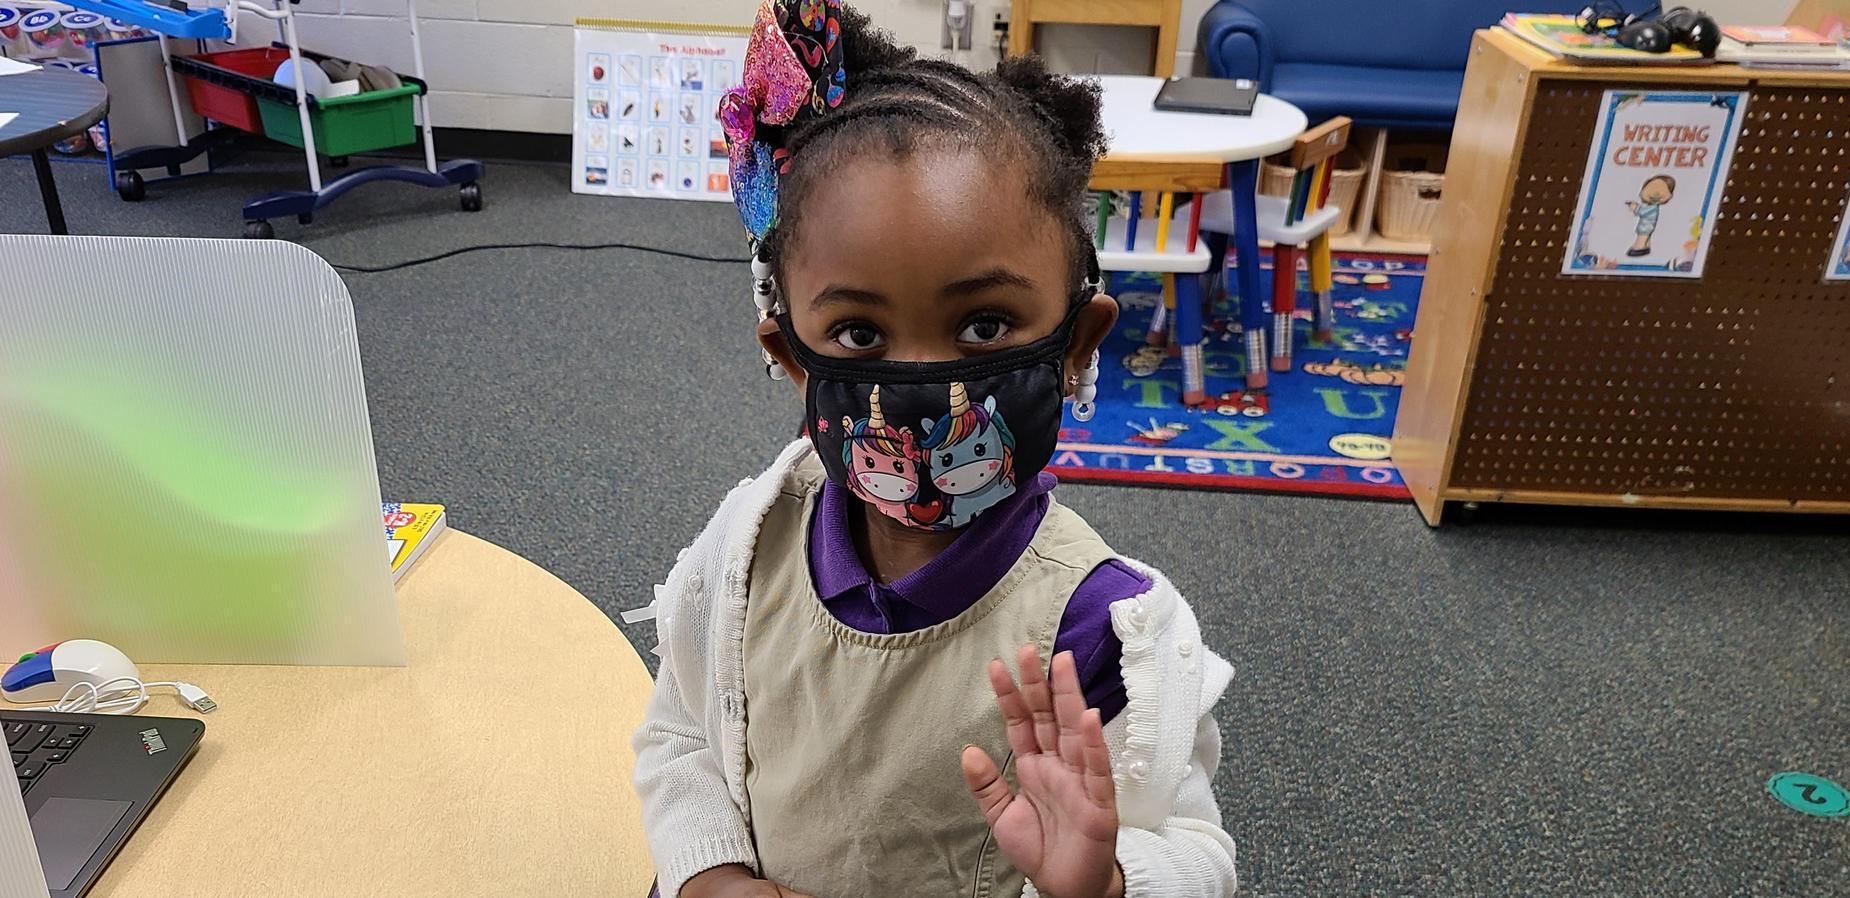 A child development student waving.